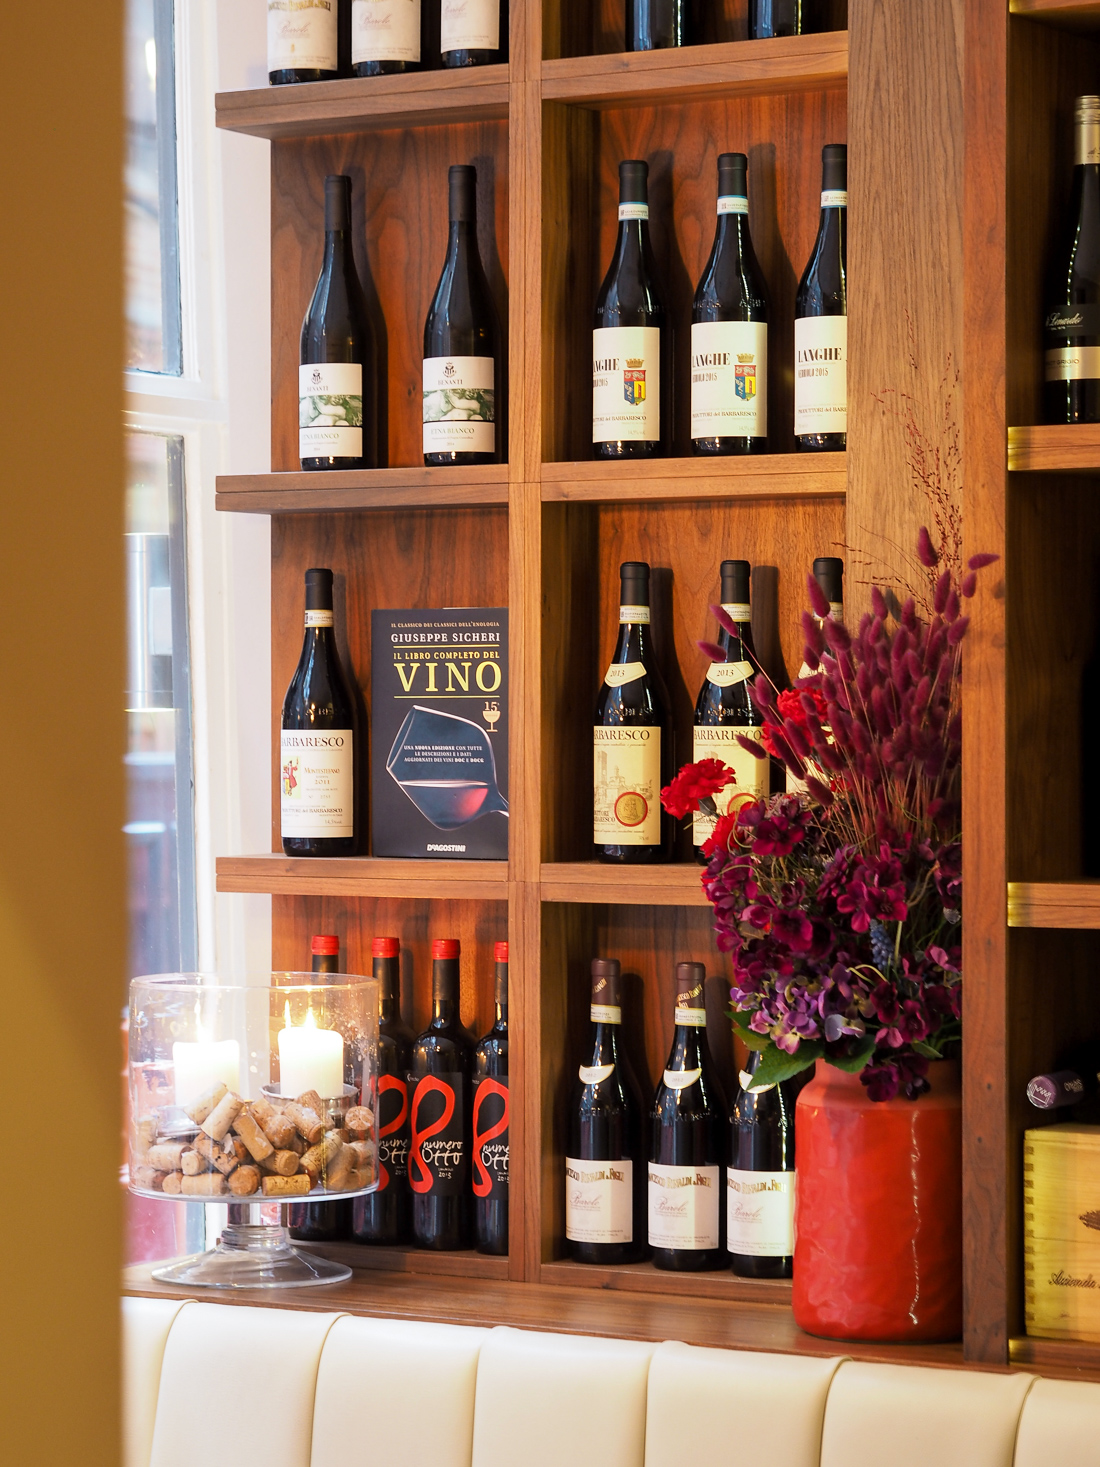 La Tagliata wines